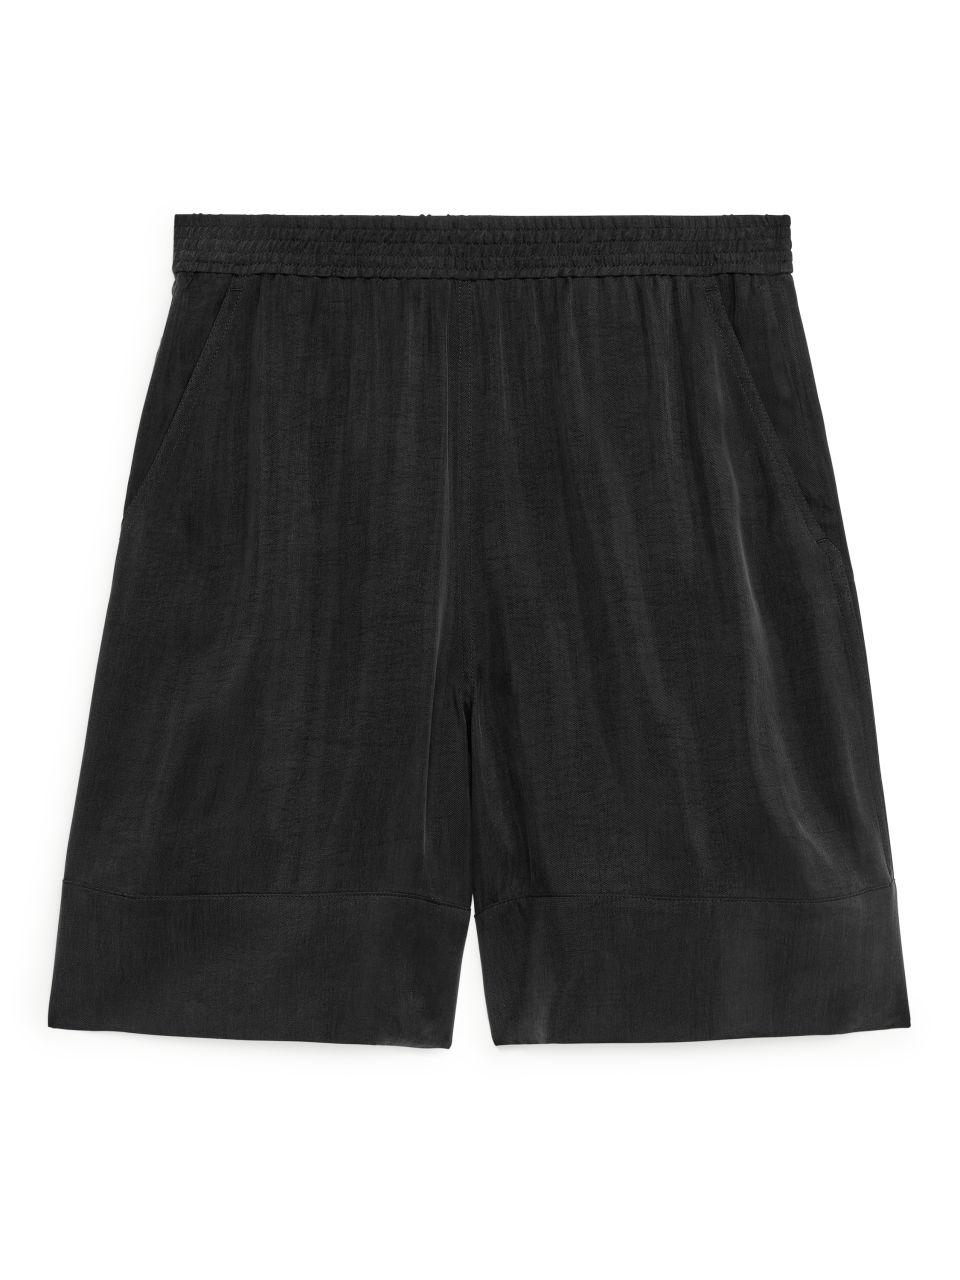 Fluid Cupro Shorts - Black